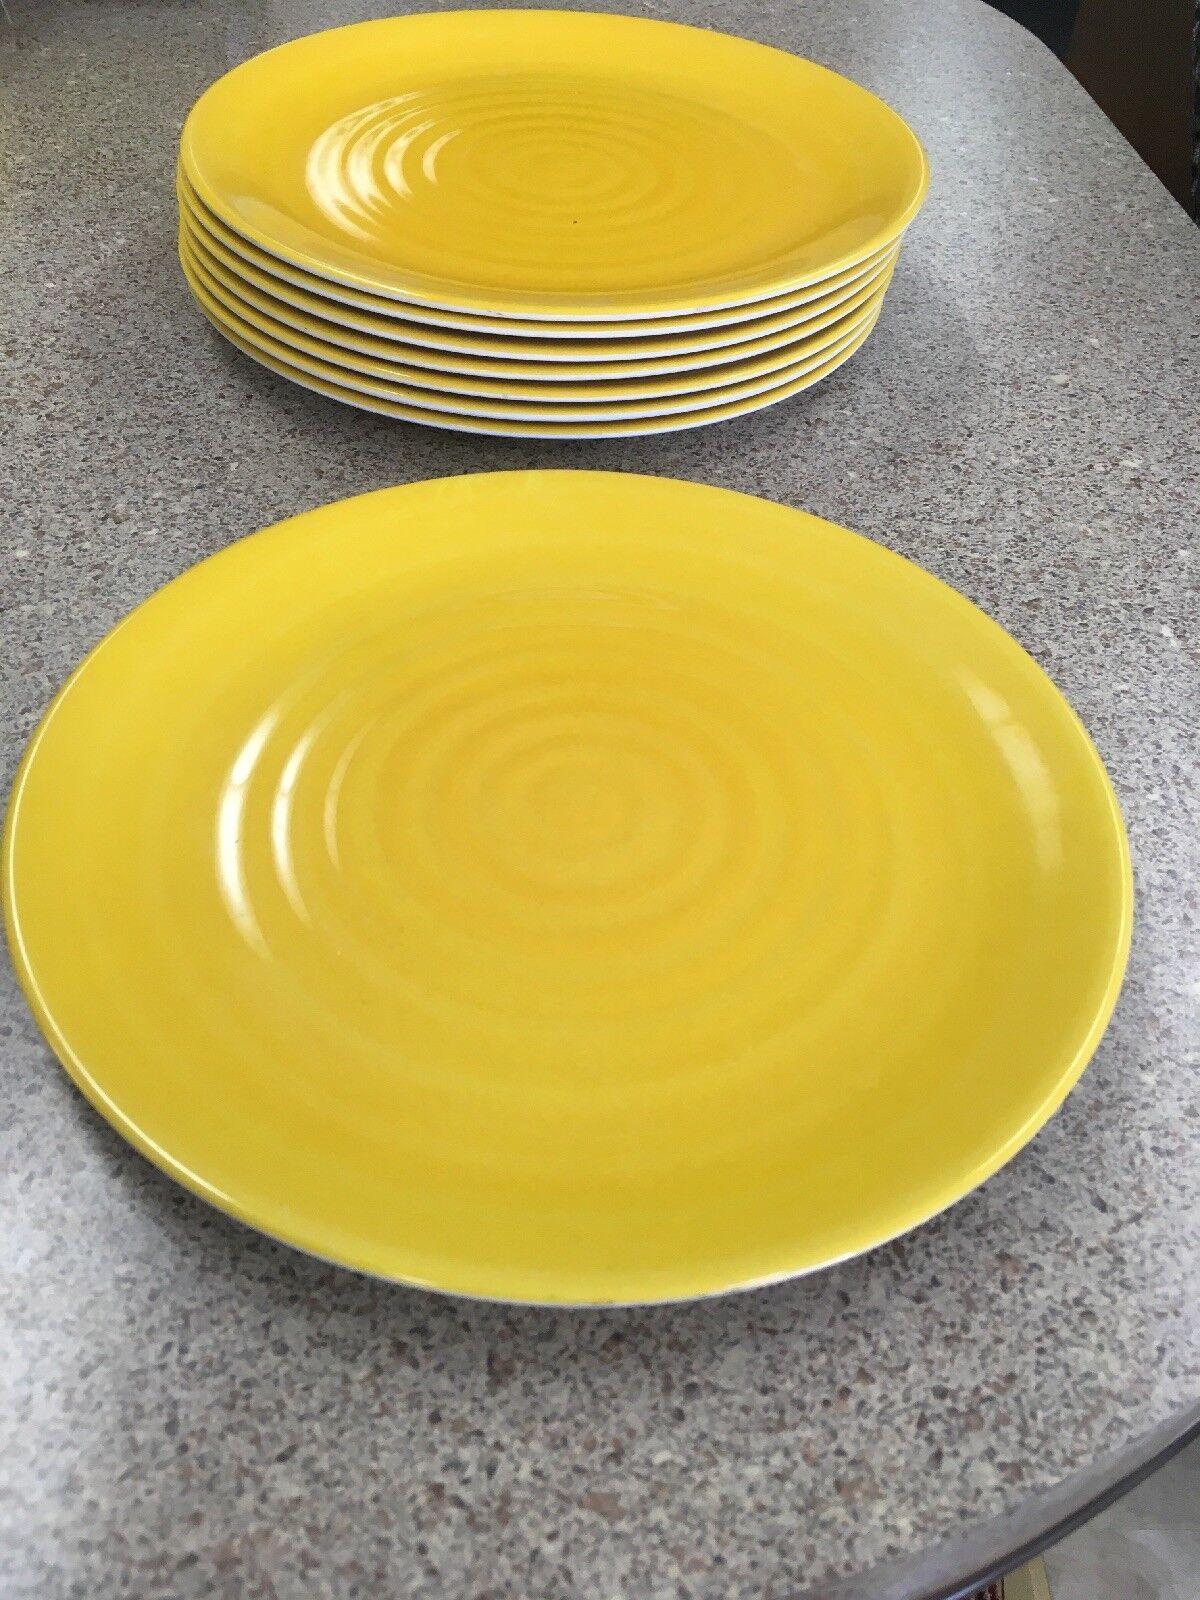 Qté 8 jaune vif 10 1 2  Precidio assiettes mélamine